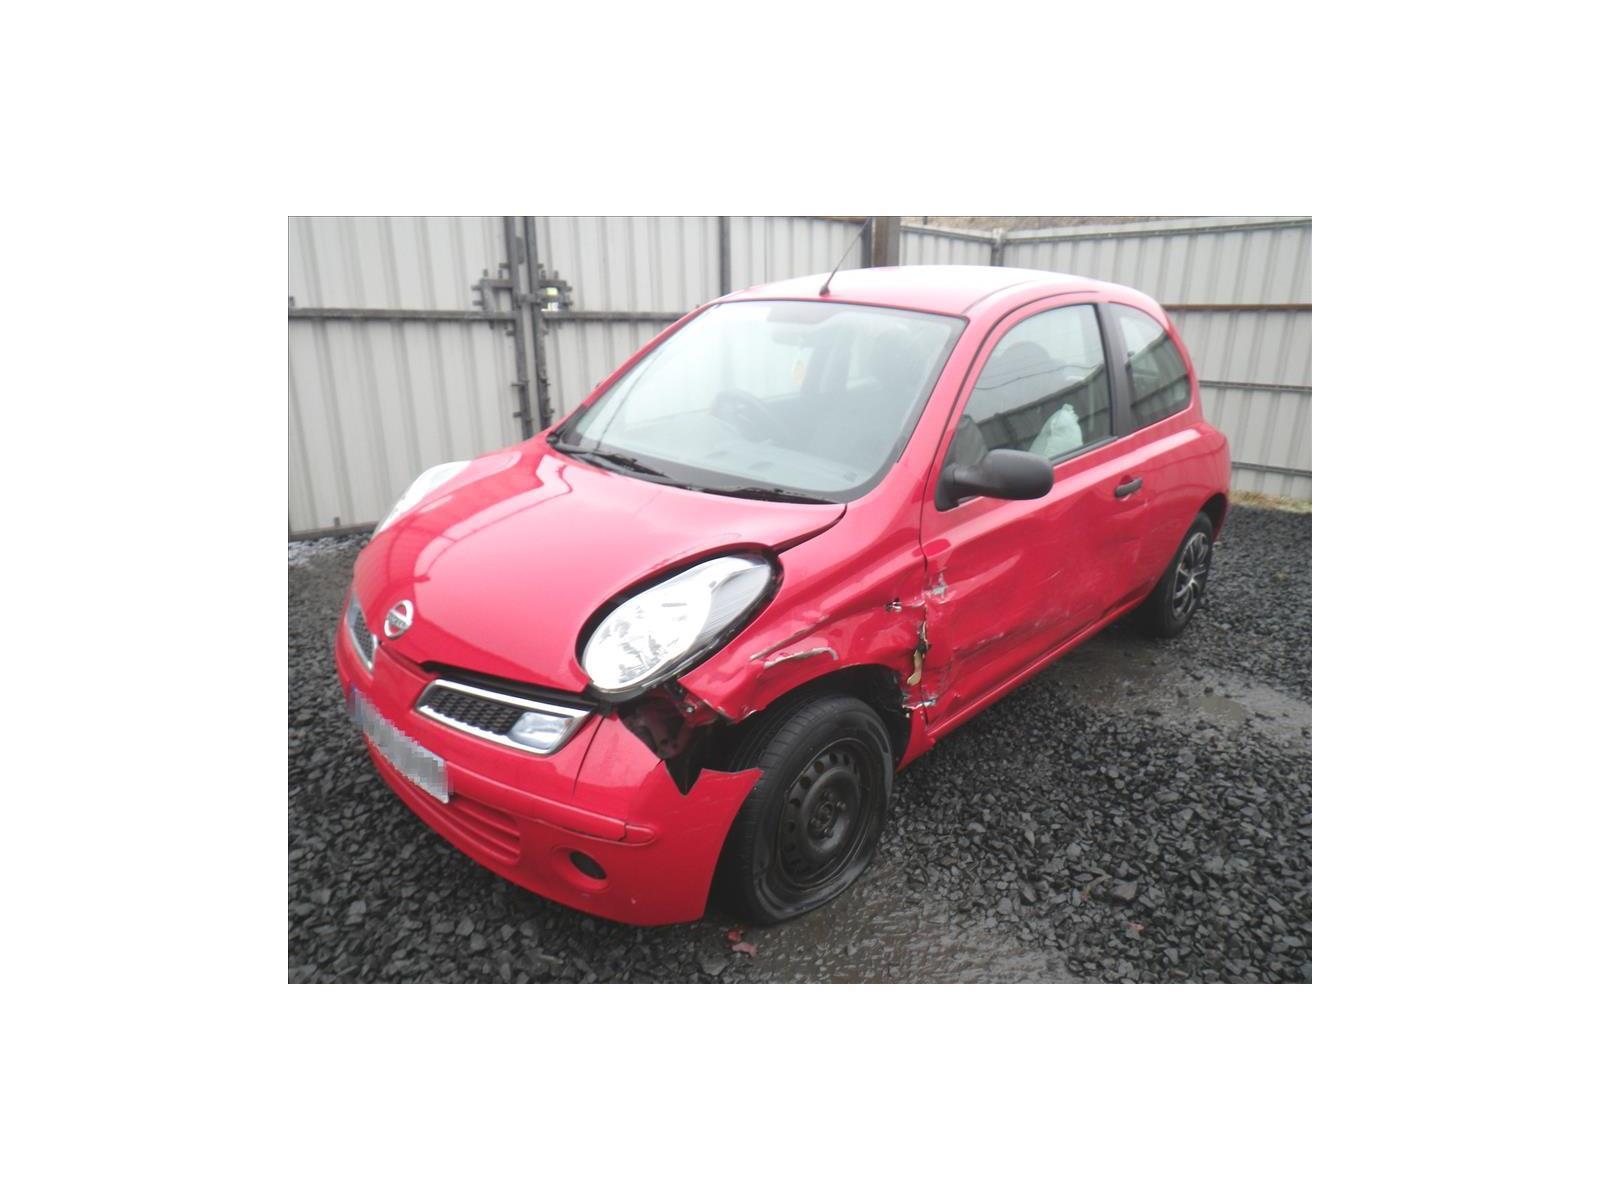 ... 2009 Nissan Micra 2007 To 2010 Visia 1.2cc Manual Petrol RED Car Lamp  Indicator Front ...